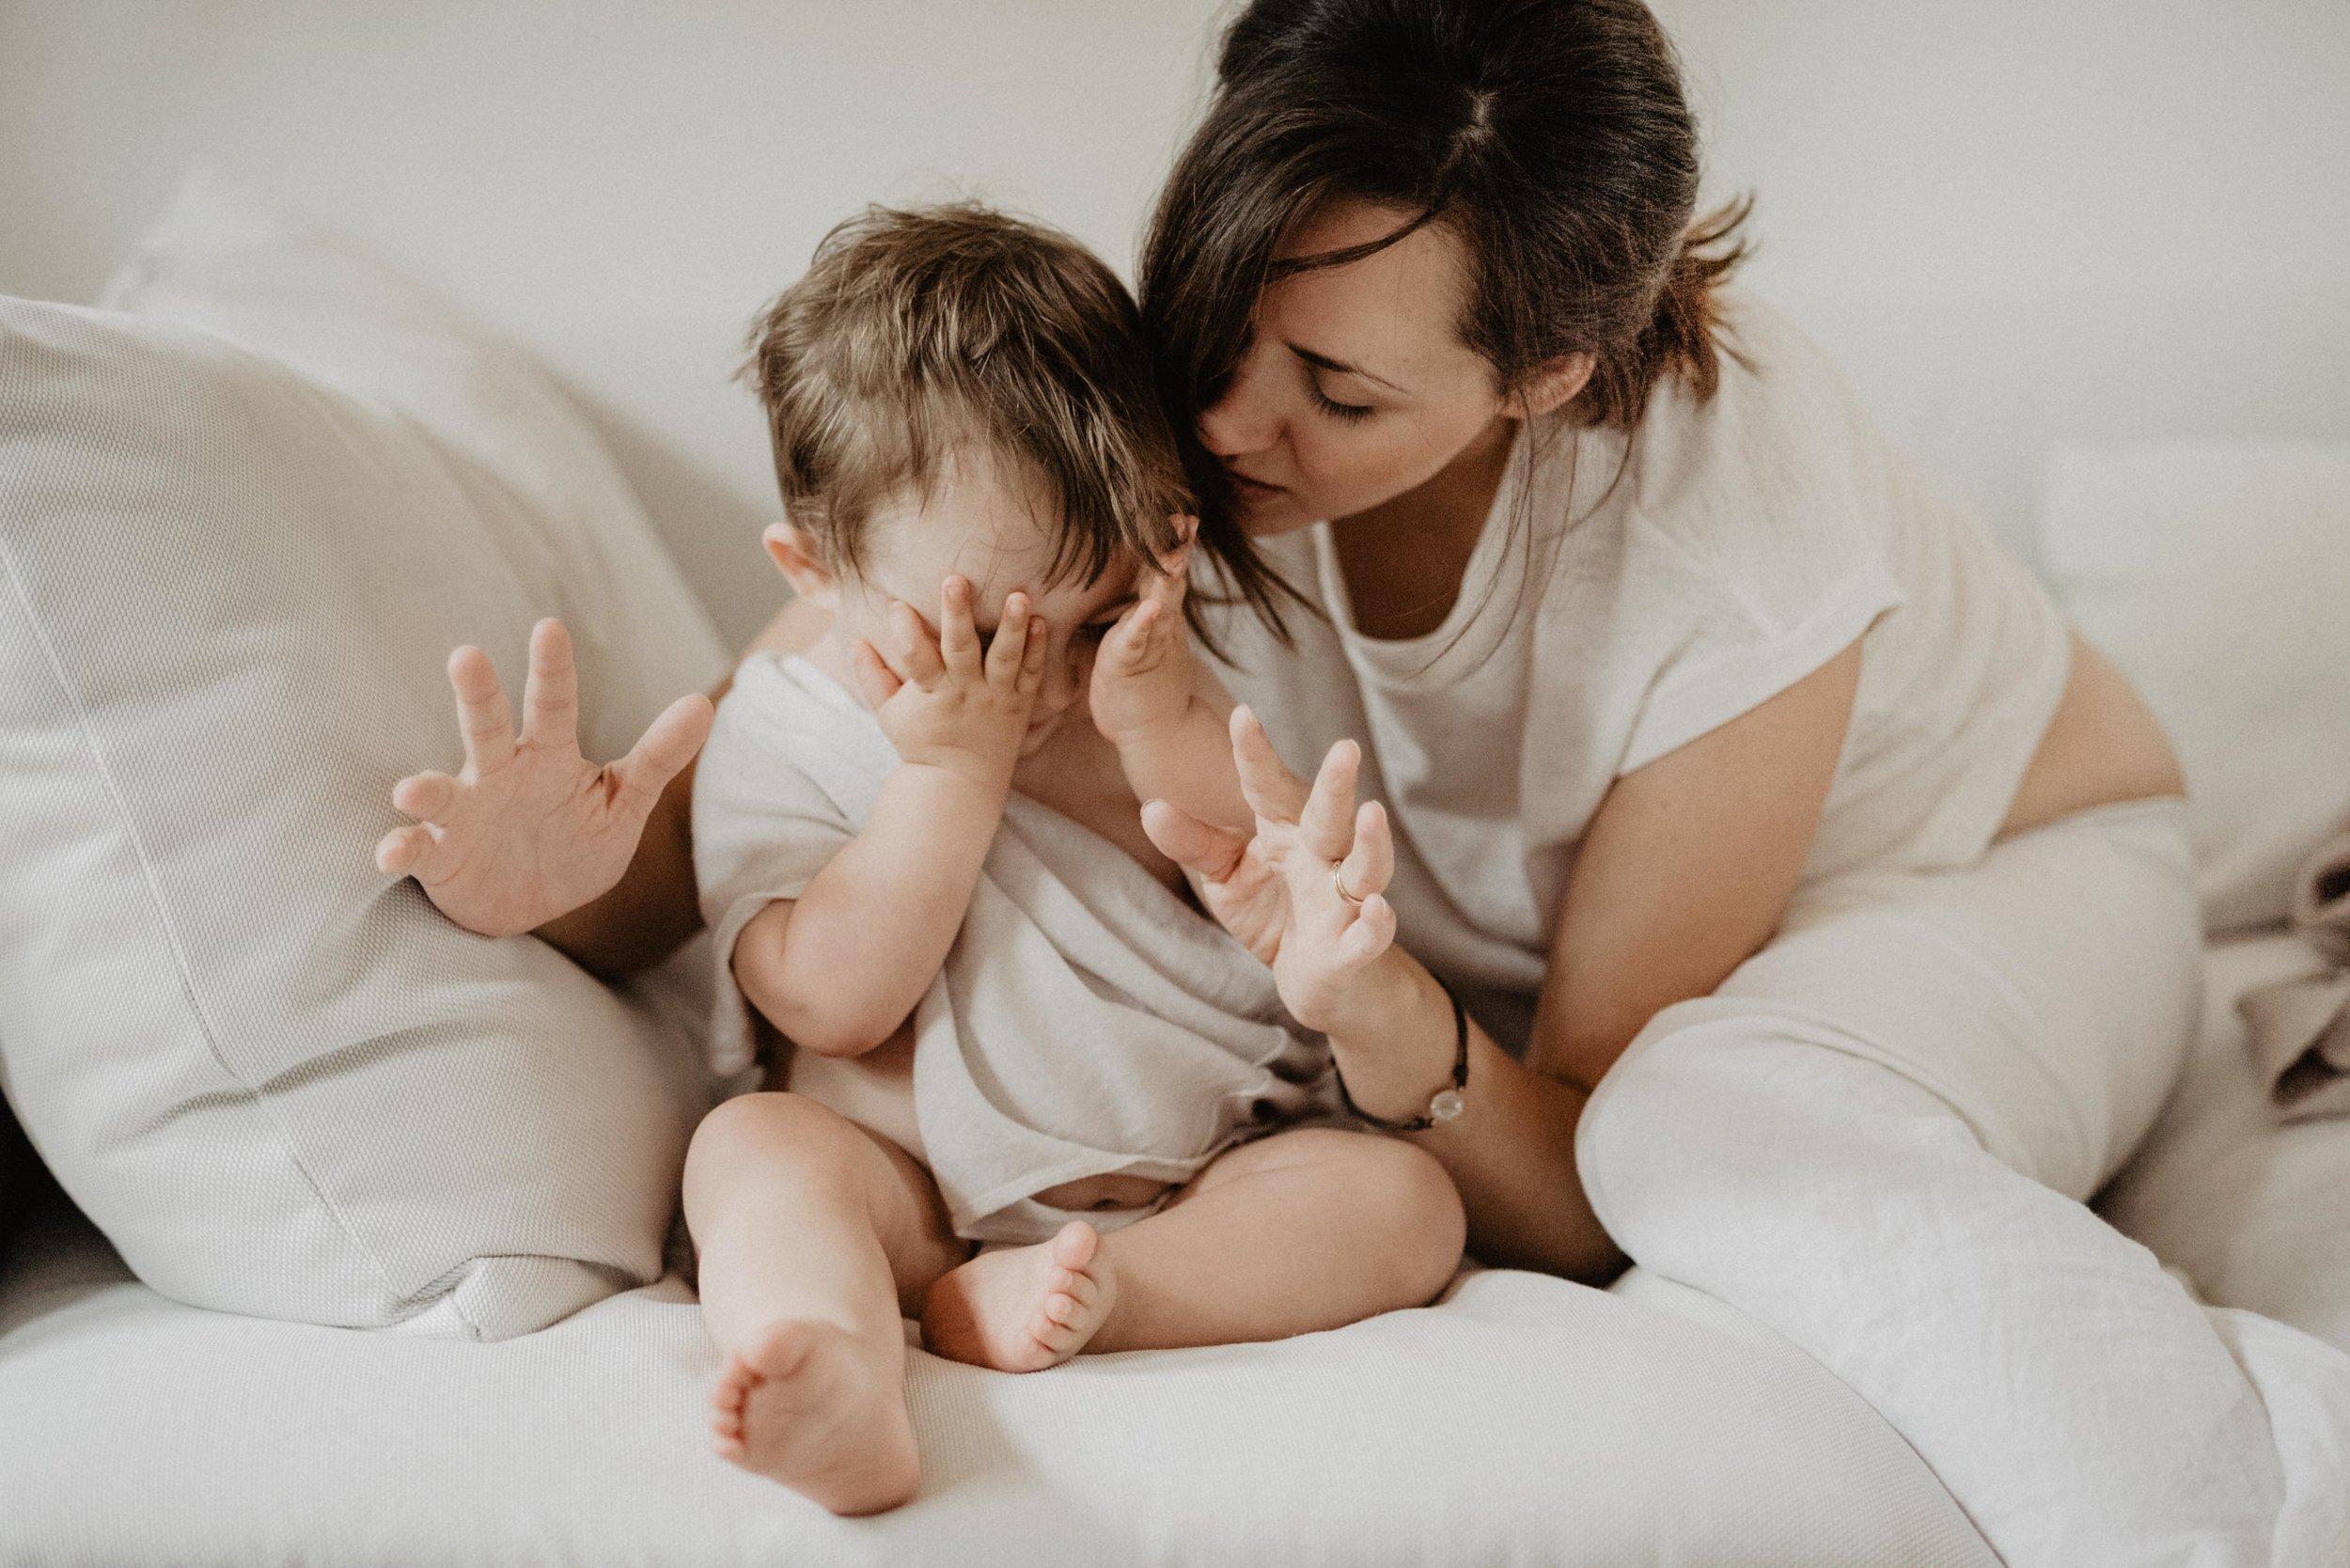 Babyshooting Familienfotografie Köln Bonn OH LUCY WEDDING_Finn und Kathi Babyshooting 16 Monate -9876.jpg